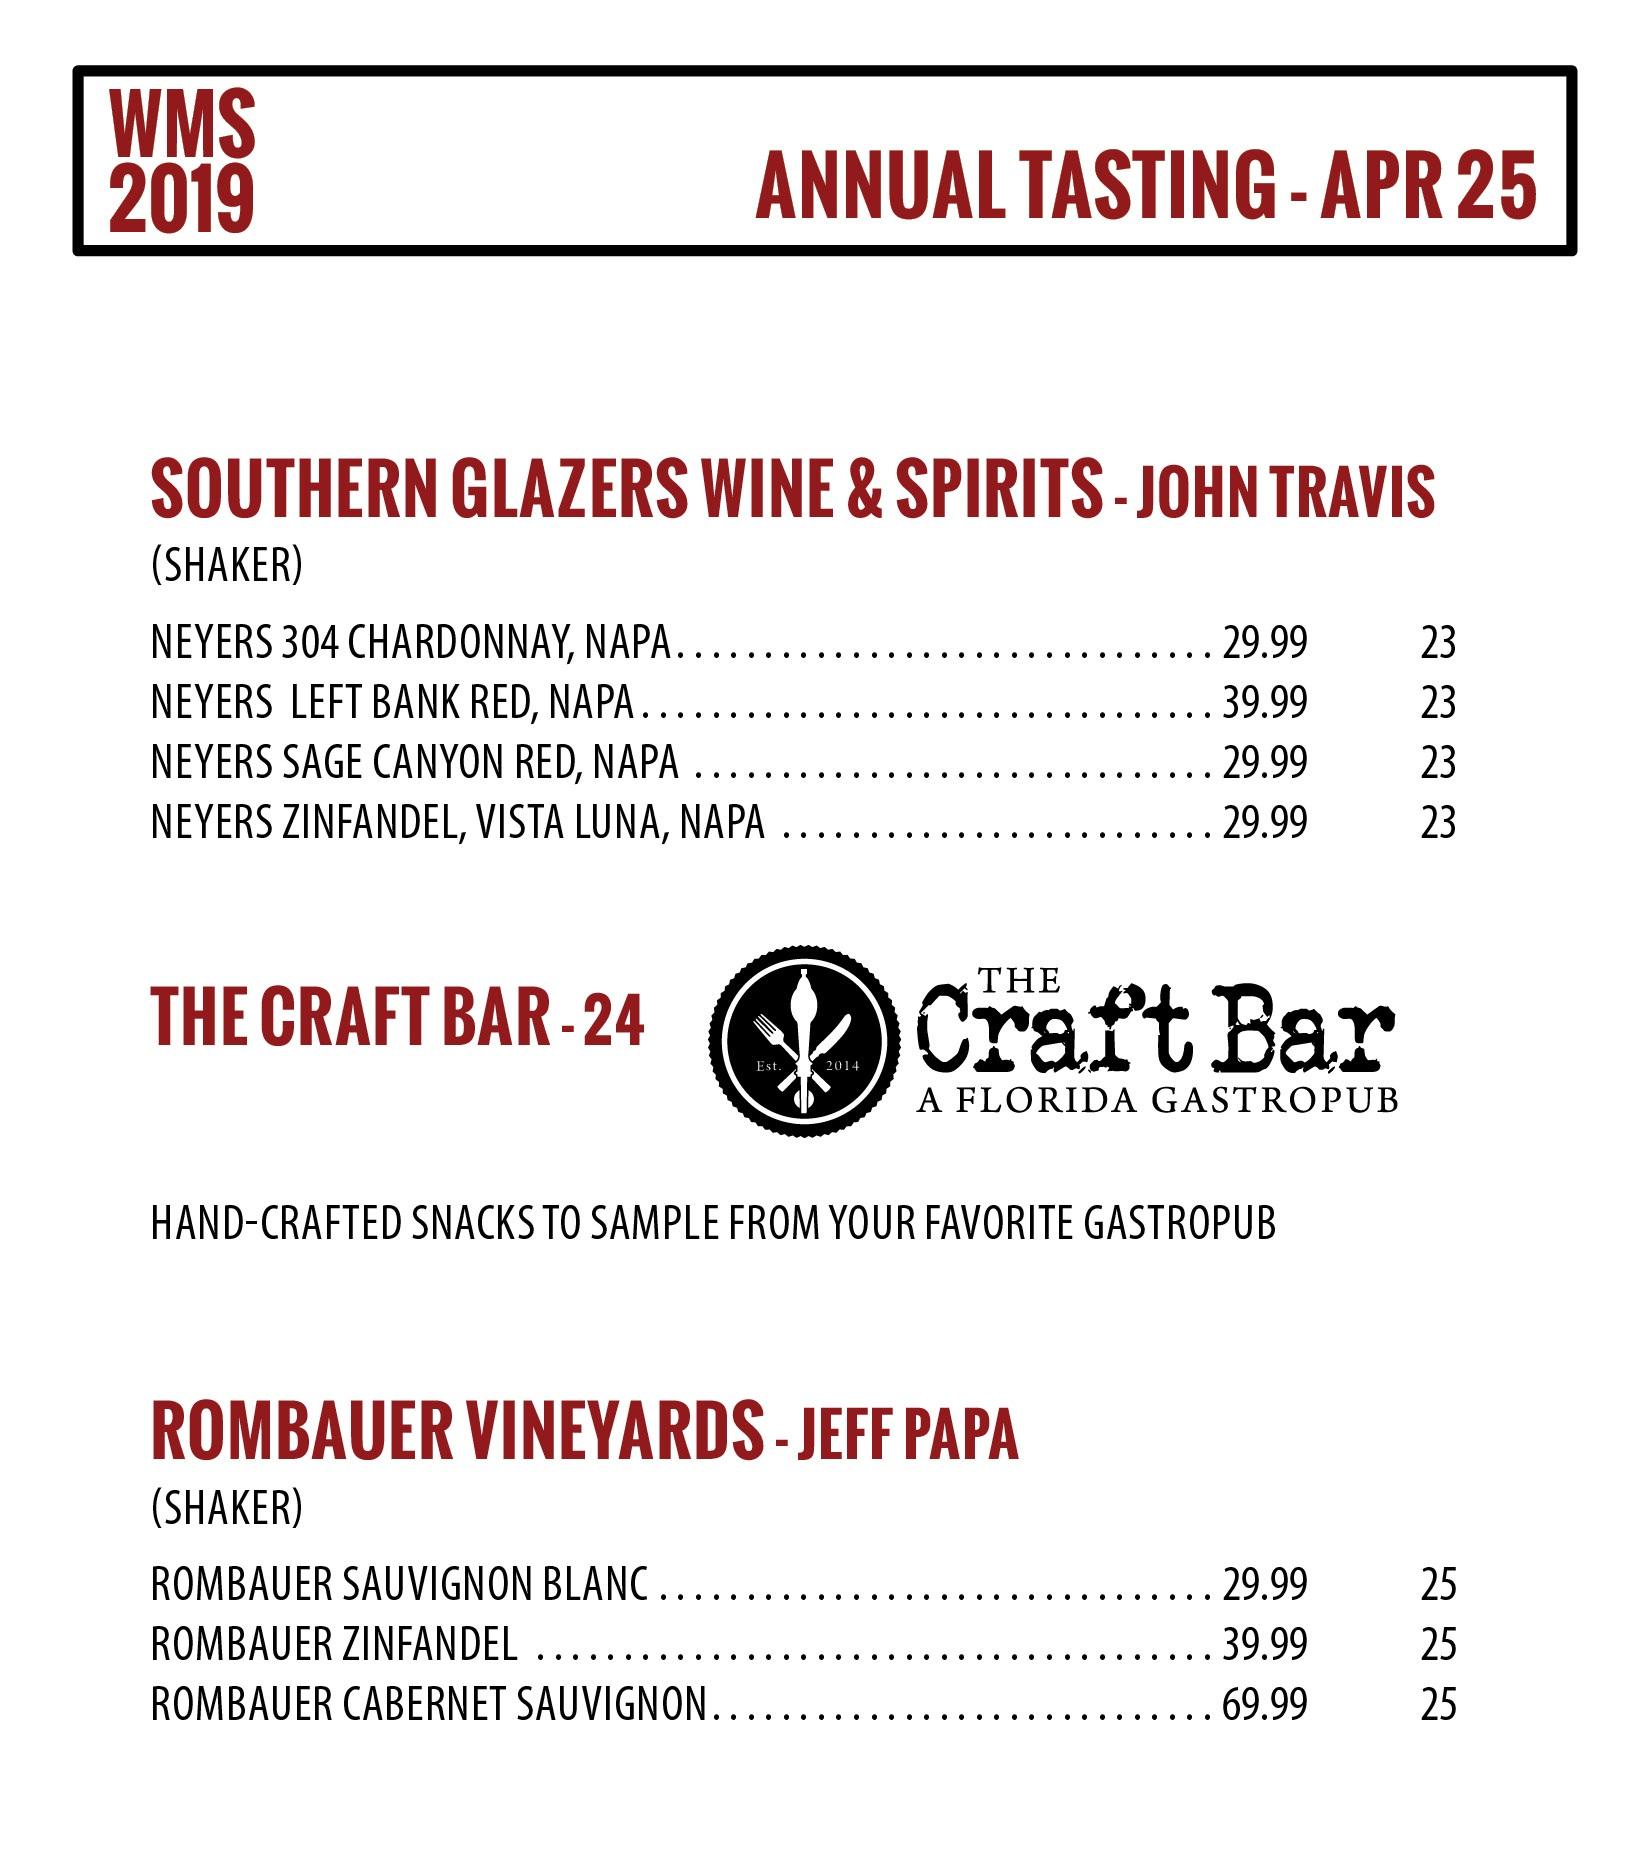 Winemakers+and+Shakers_Tasting+Guide_201910.jpg